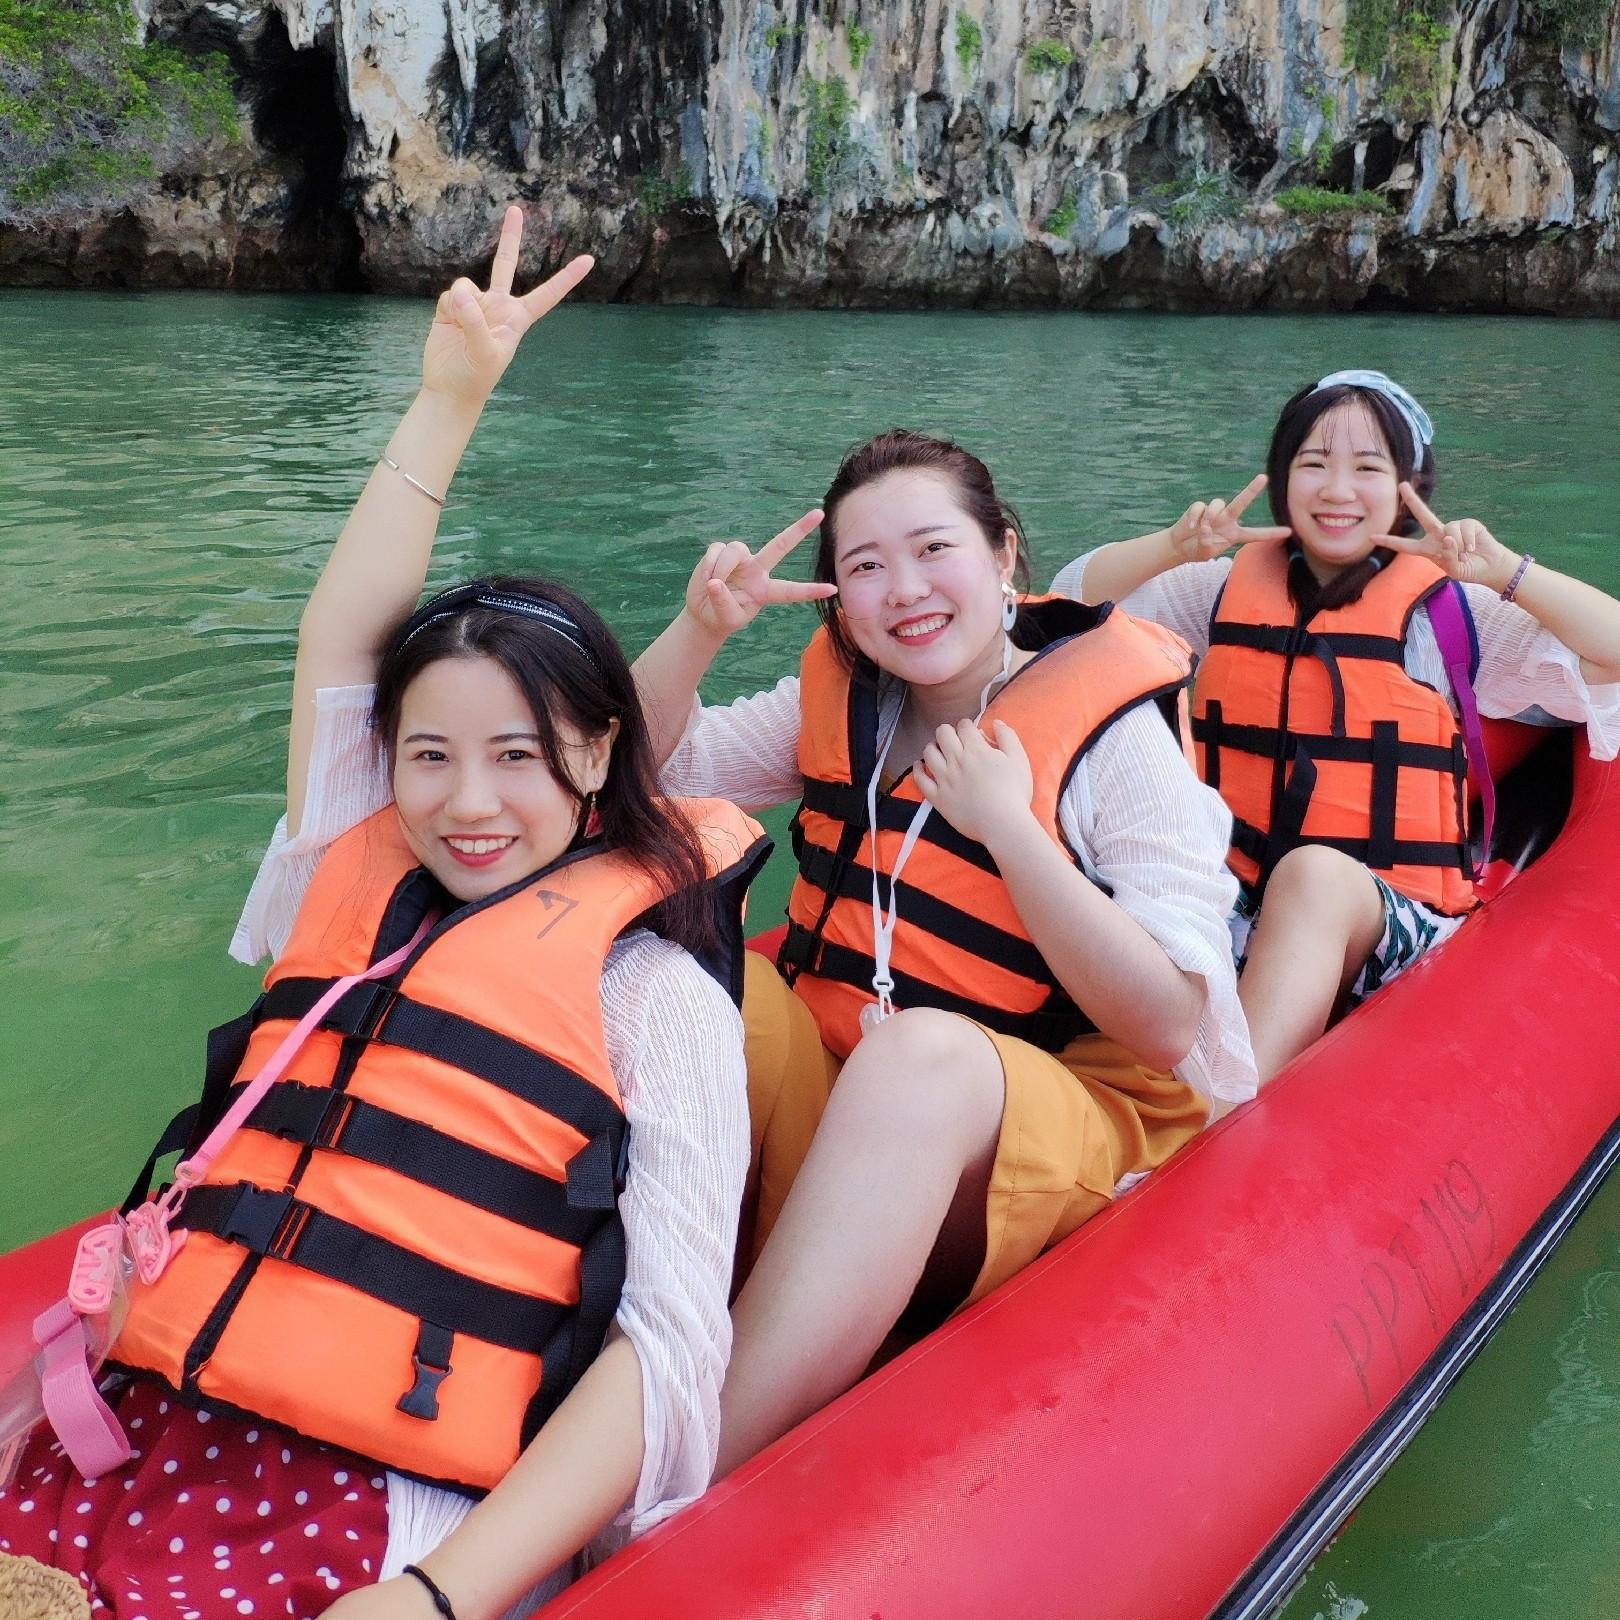 Franmei Paper's Thailand 11th Tour